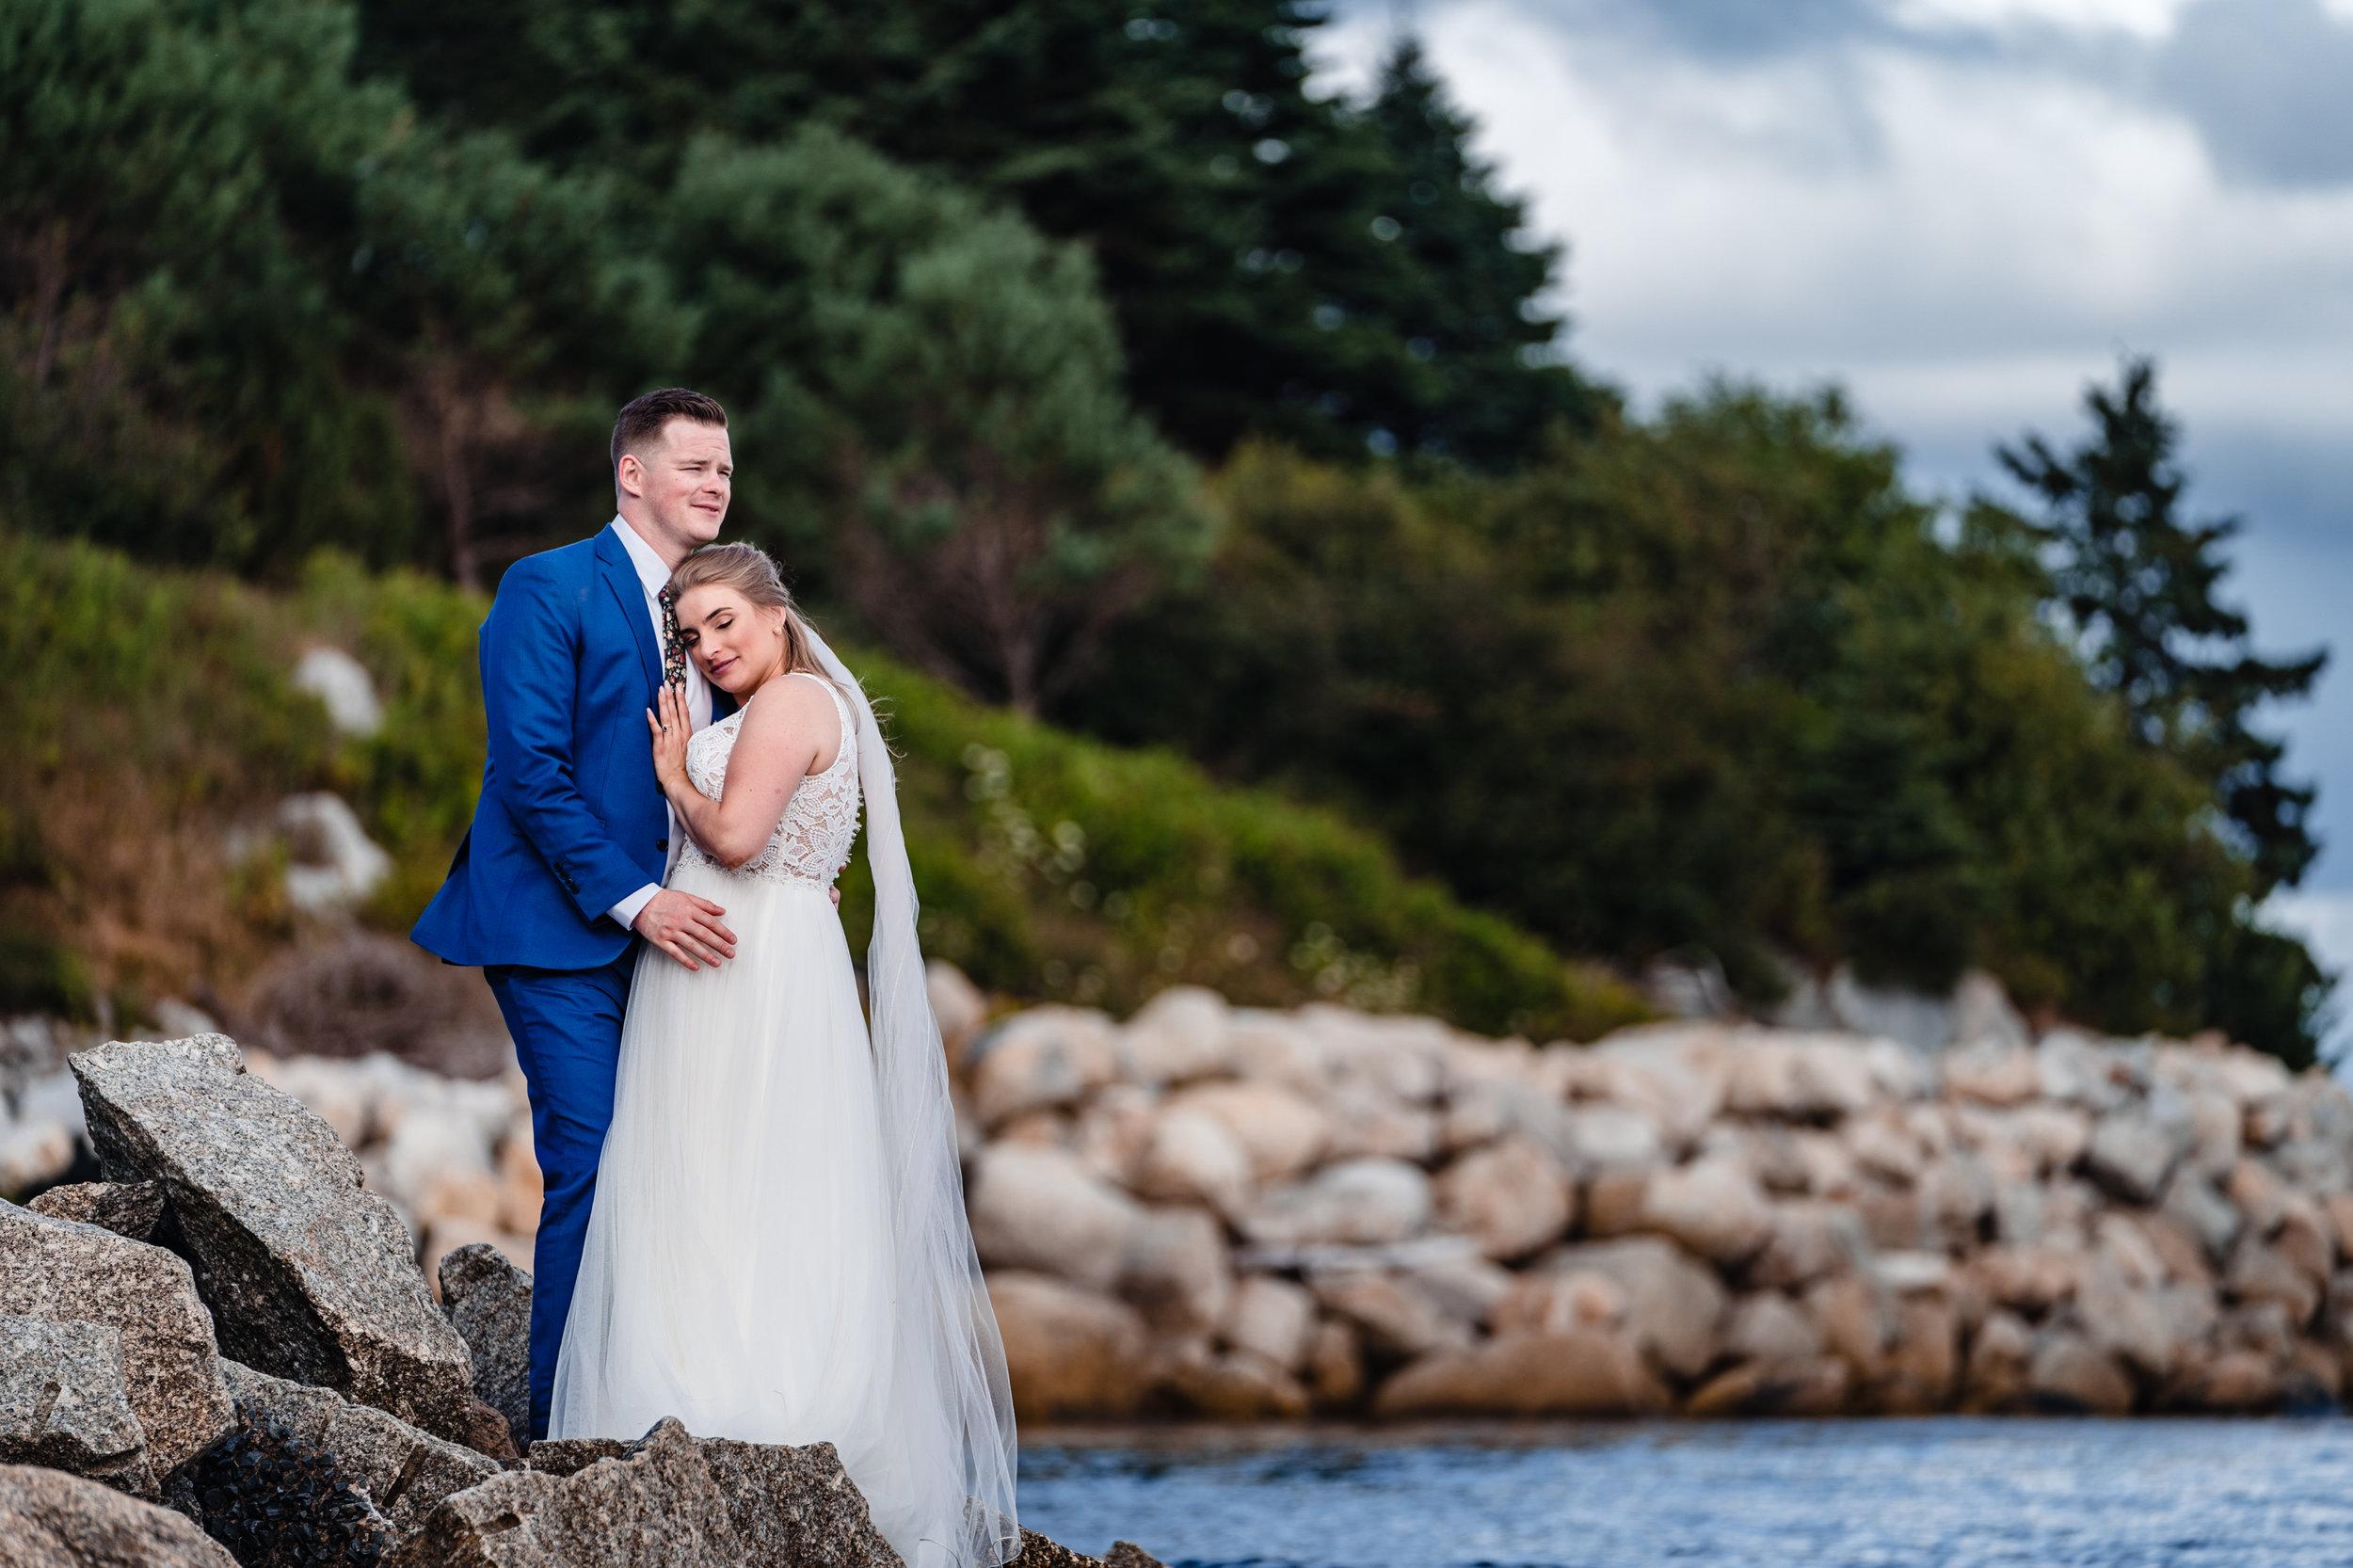 Janelle-Mitch-Halifax-Wedding-Nova-Scotia-Photography (79 of 163).jpg